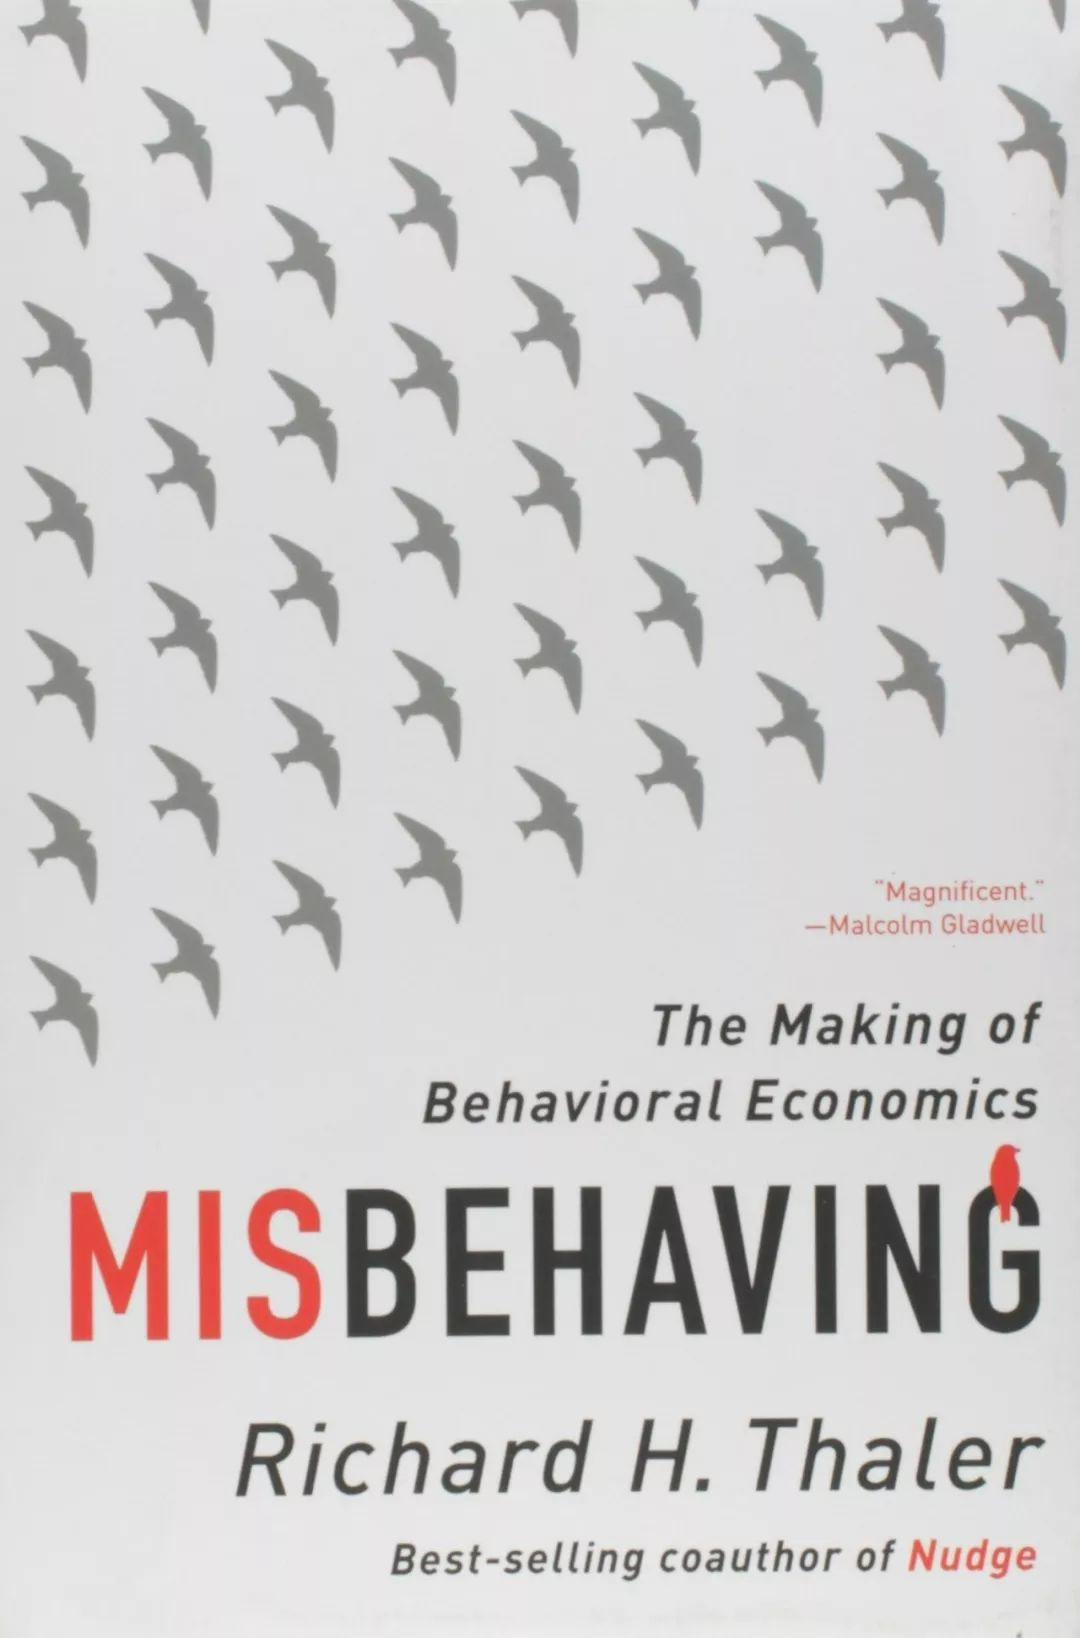 A-level经济学名师推荐:做经济学延伸阅读,必读这些书籍!  经济 第7张